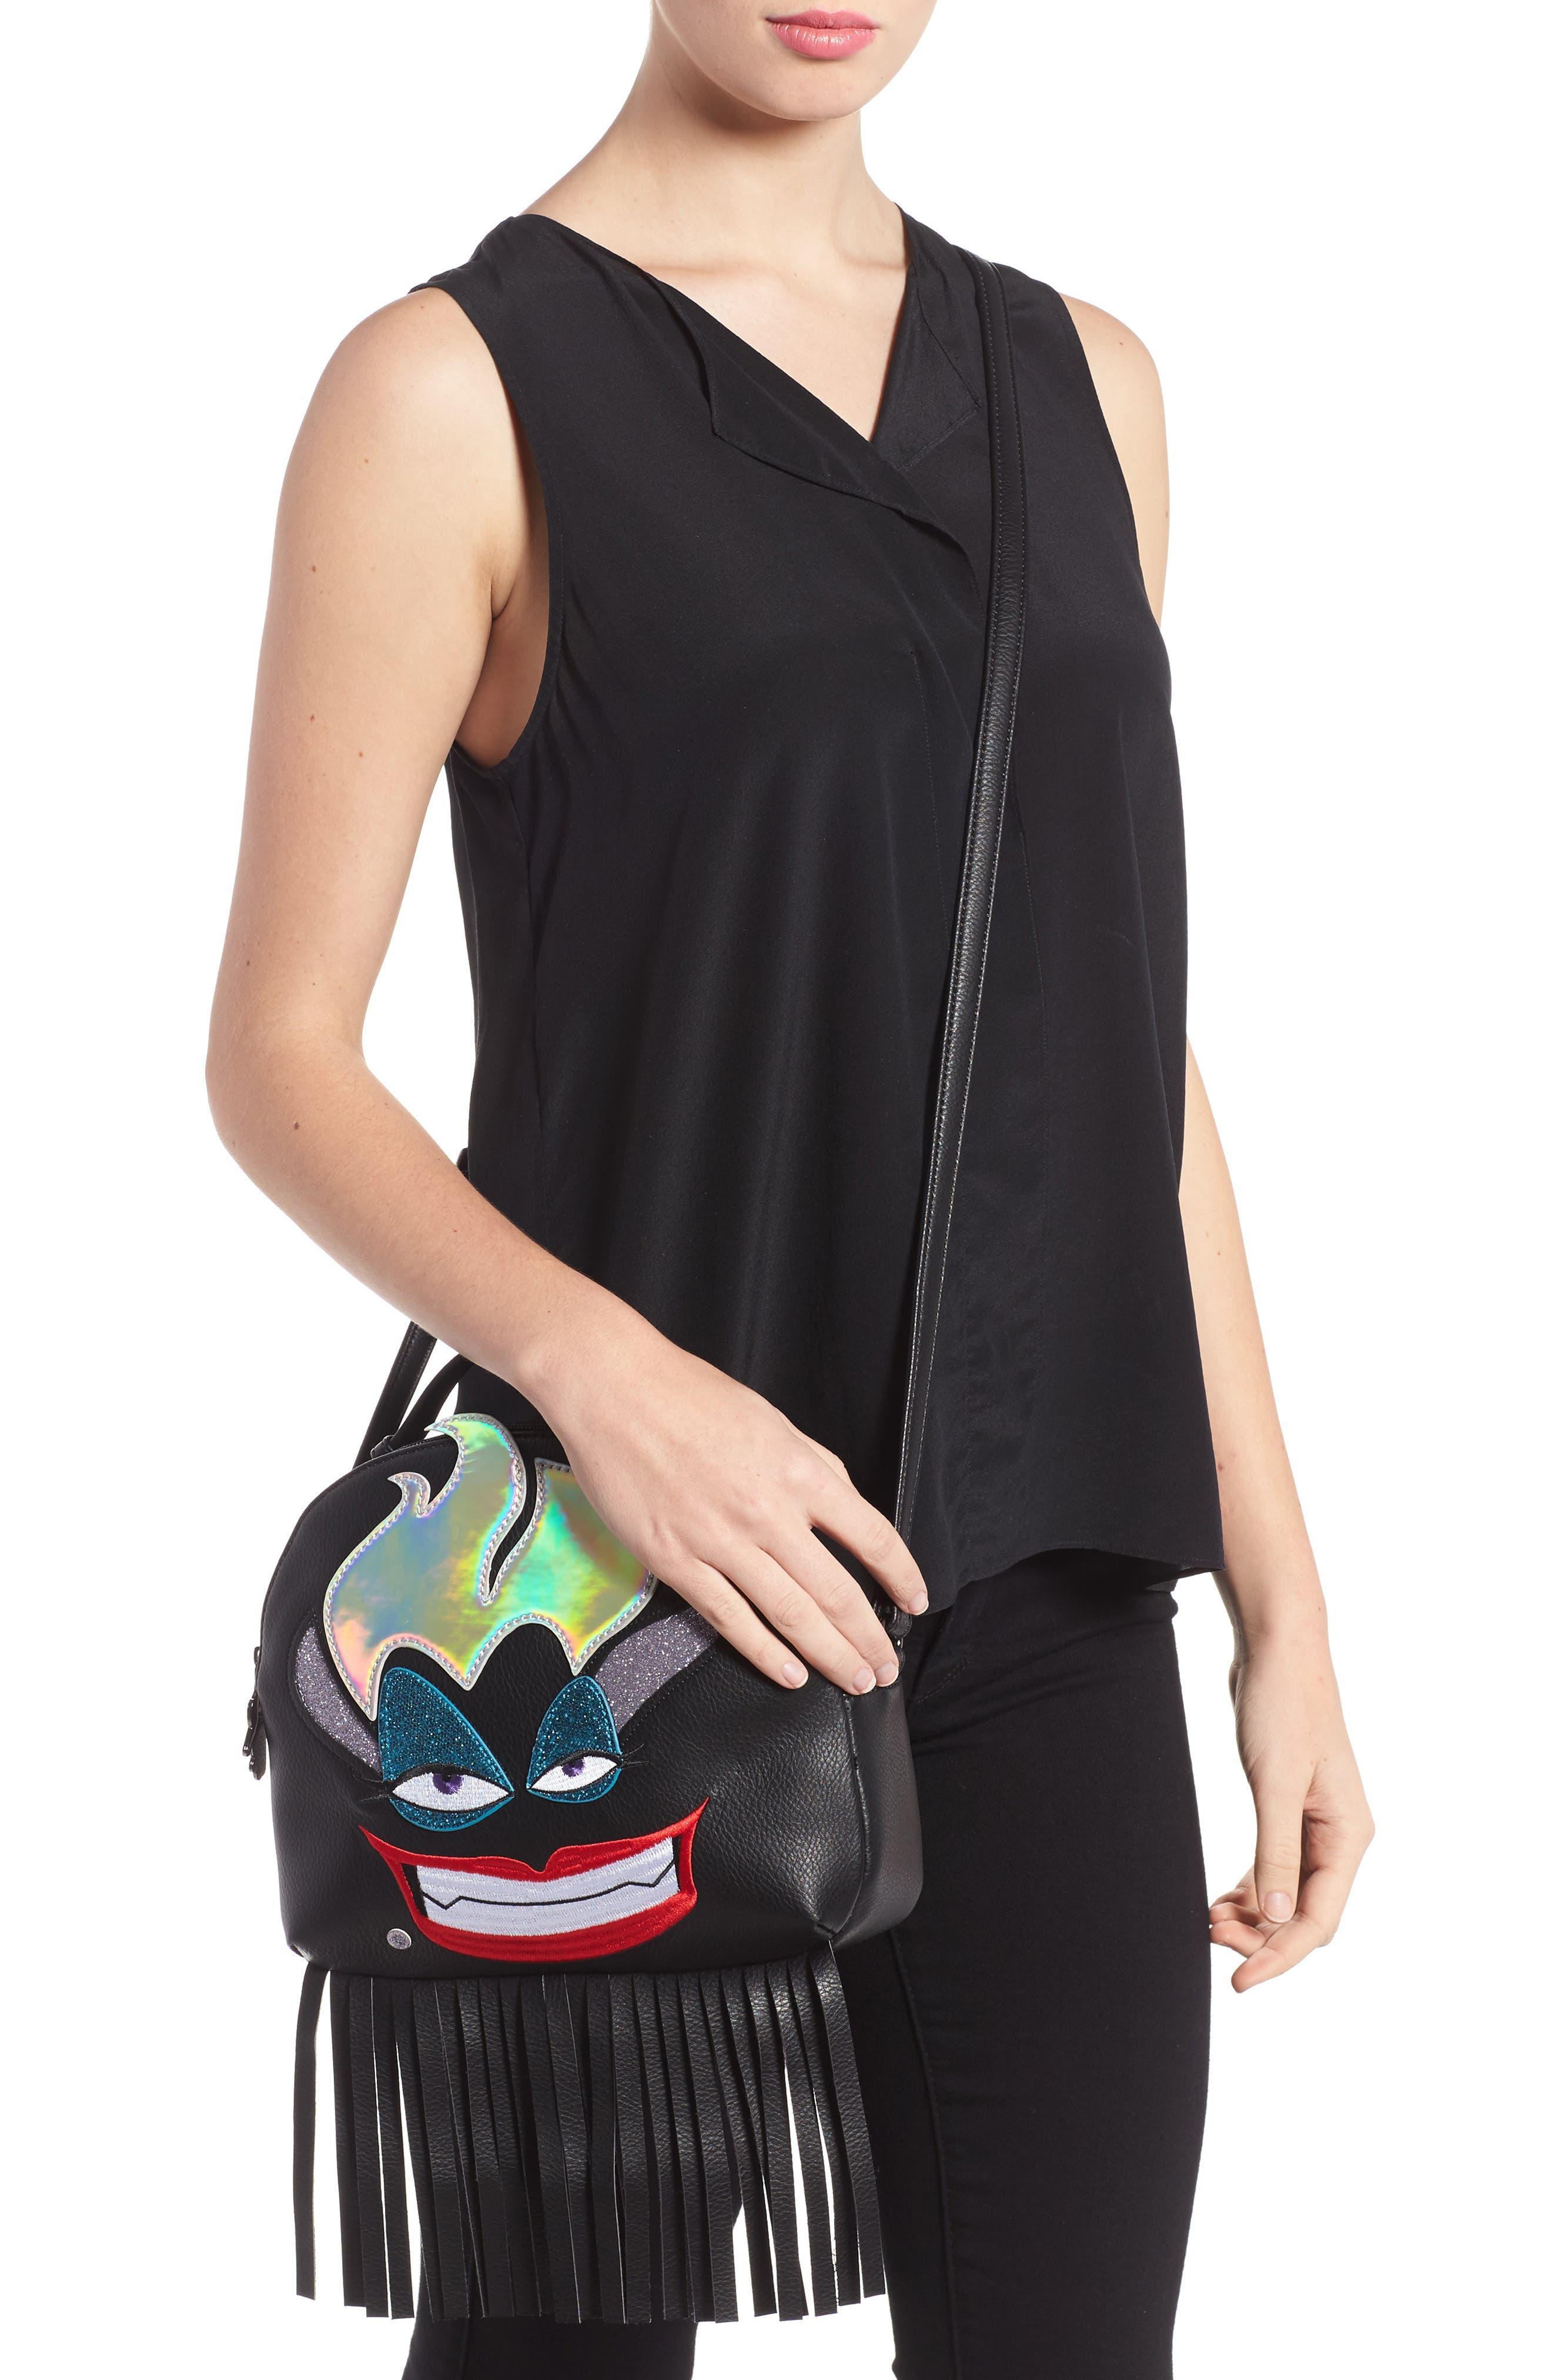 DANIELLE NICOLE,                             x Disney<sup>®</sup> Ursula Faux Leather Crossbody Bag,                             Alternate thumbnail 3, color,                             001